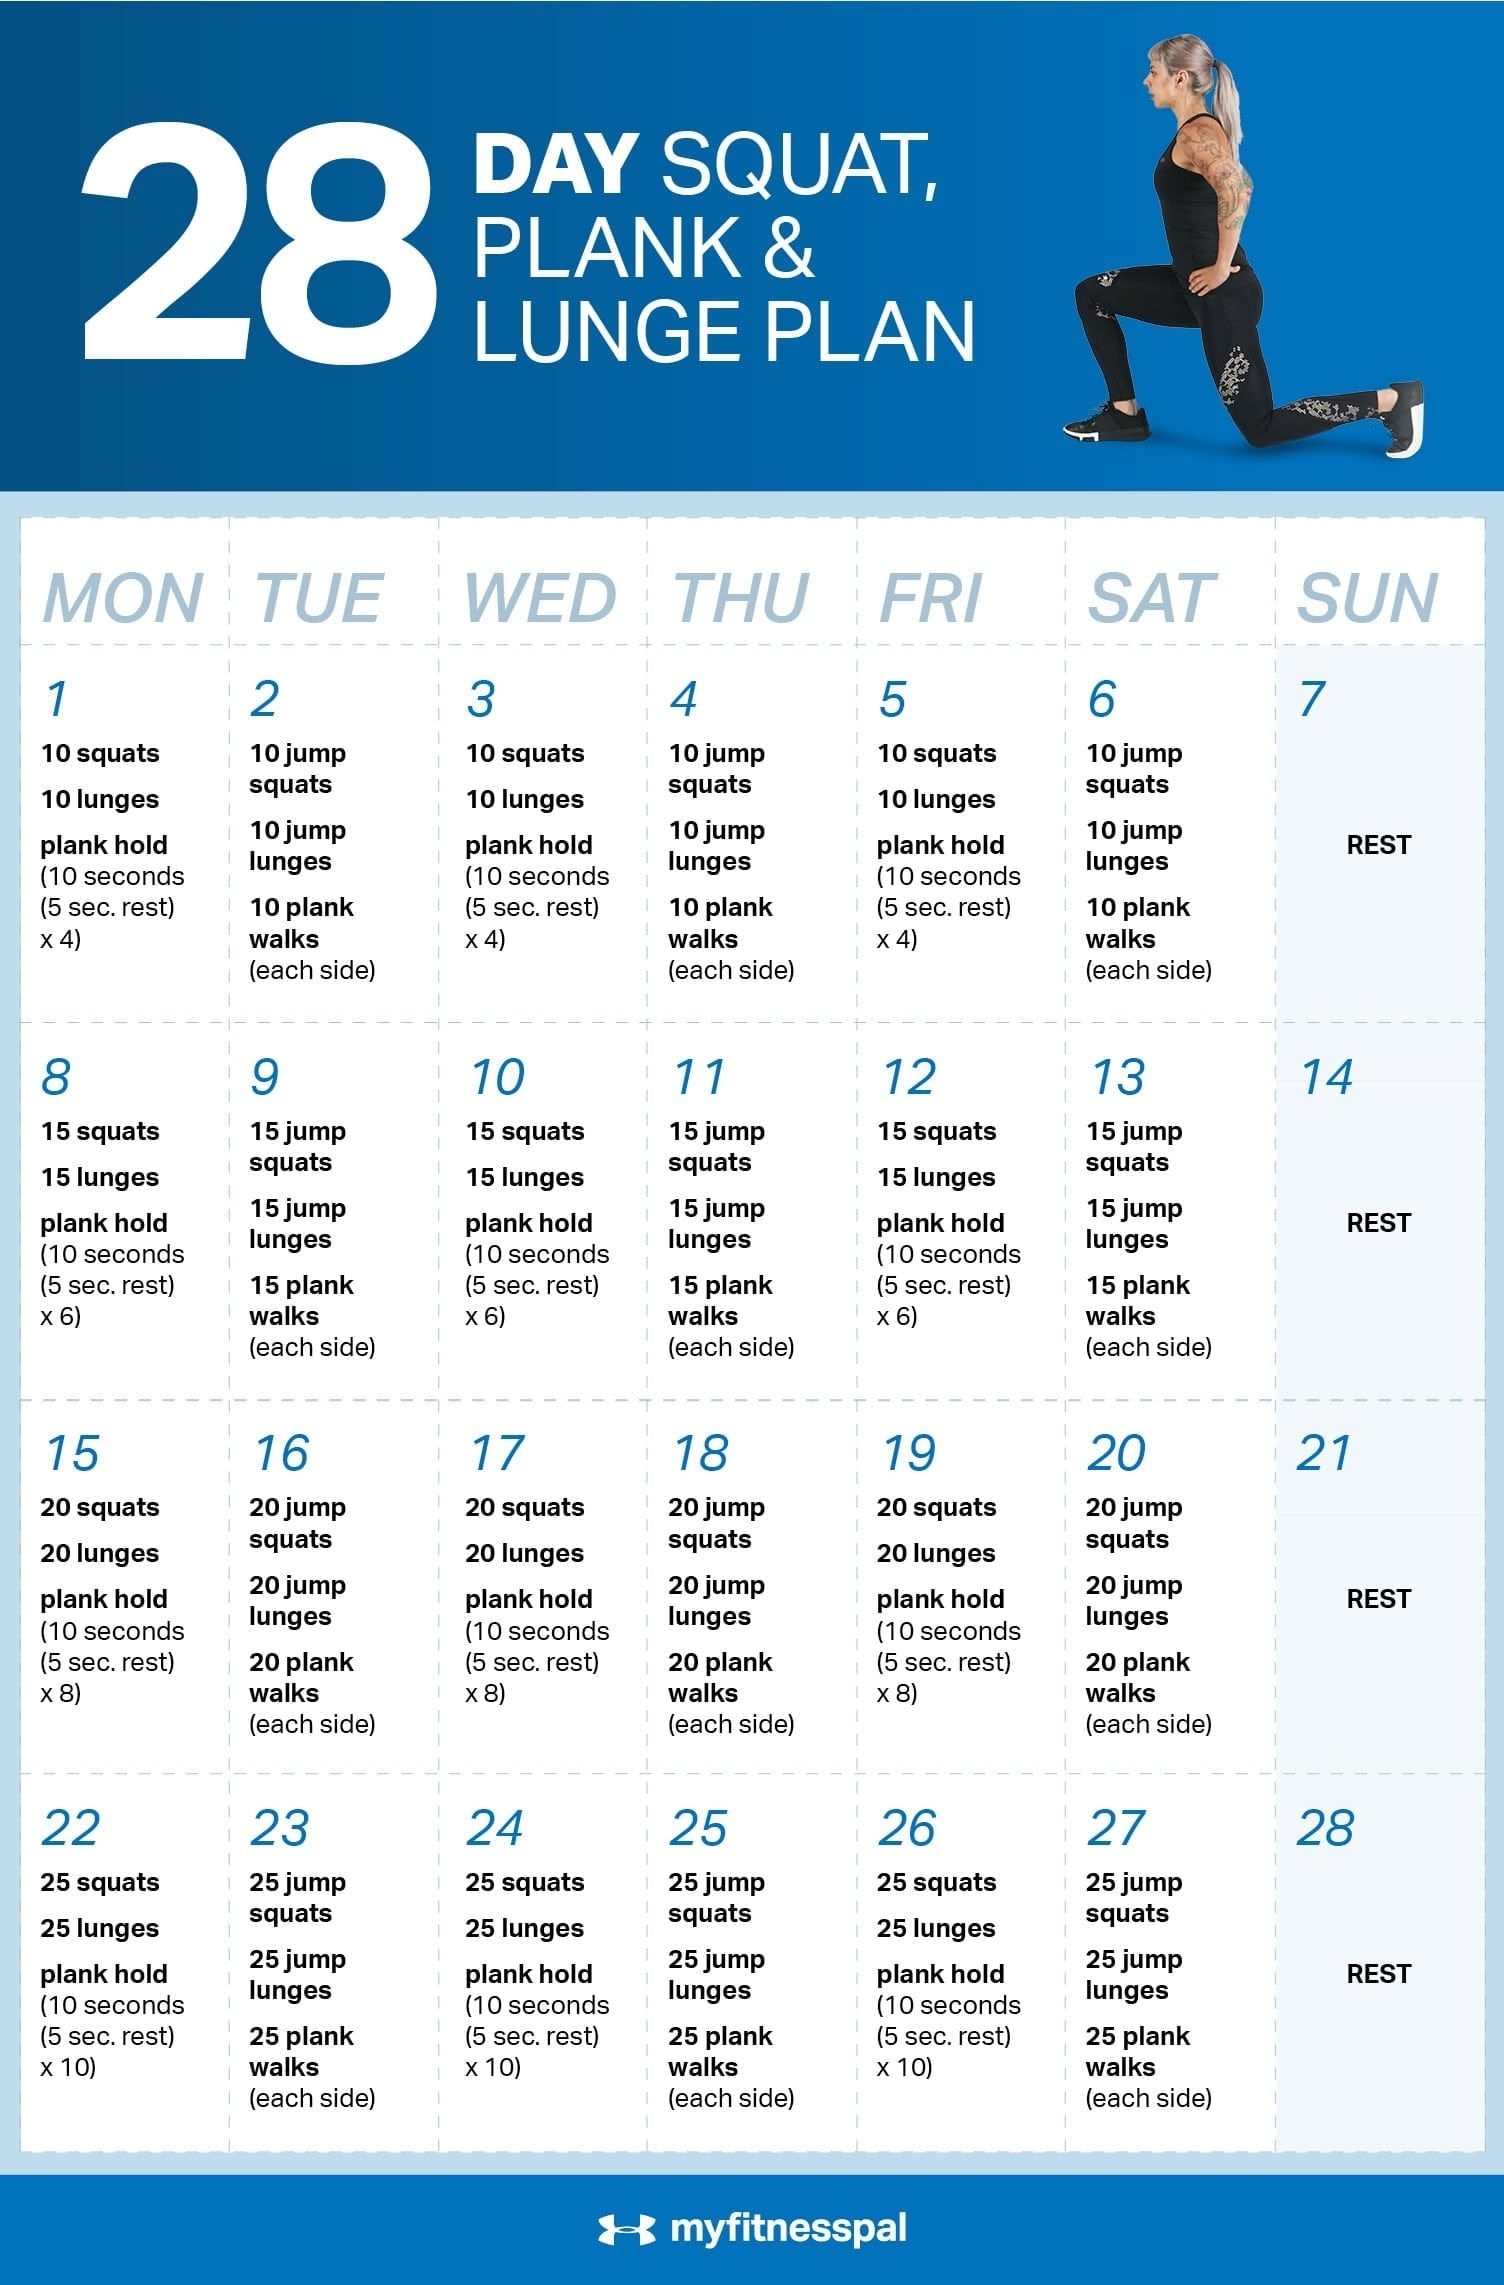 28-Day Squat, Plank & Lunge Plan | Fitness | Myfitnesspal